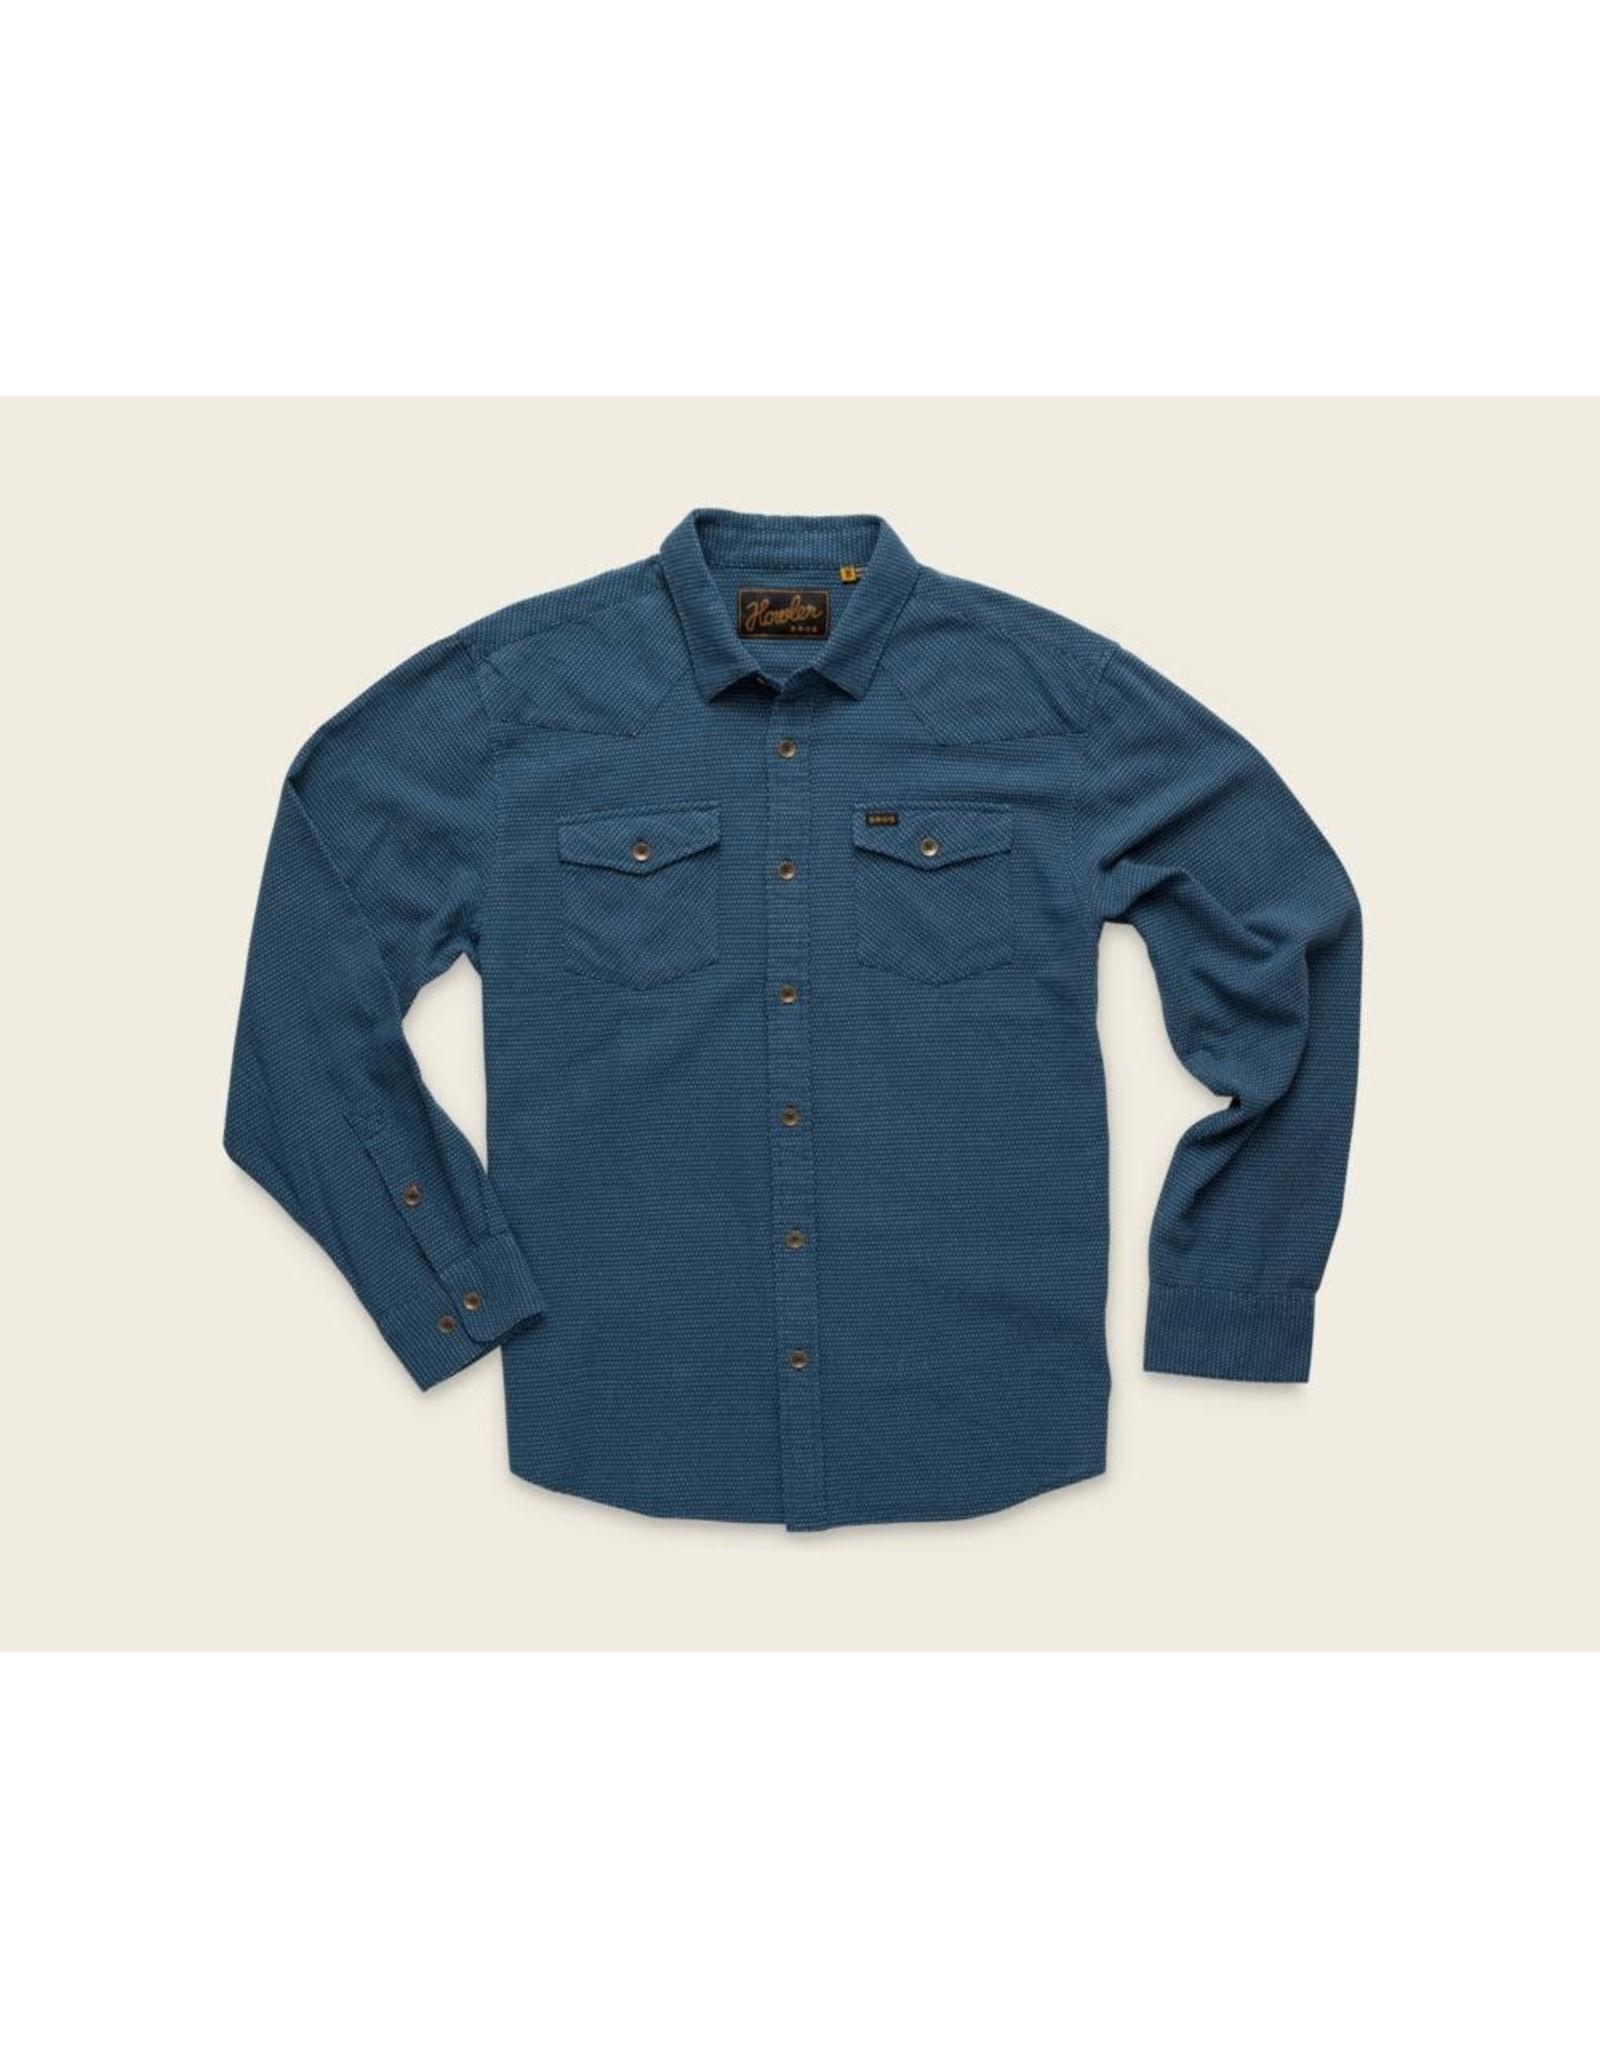 Howler Bros HB Sheridan Shirt - Pinpoints